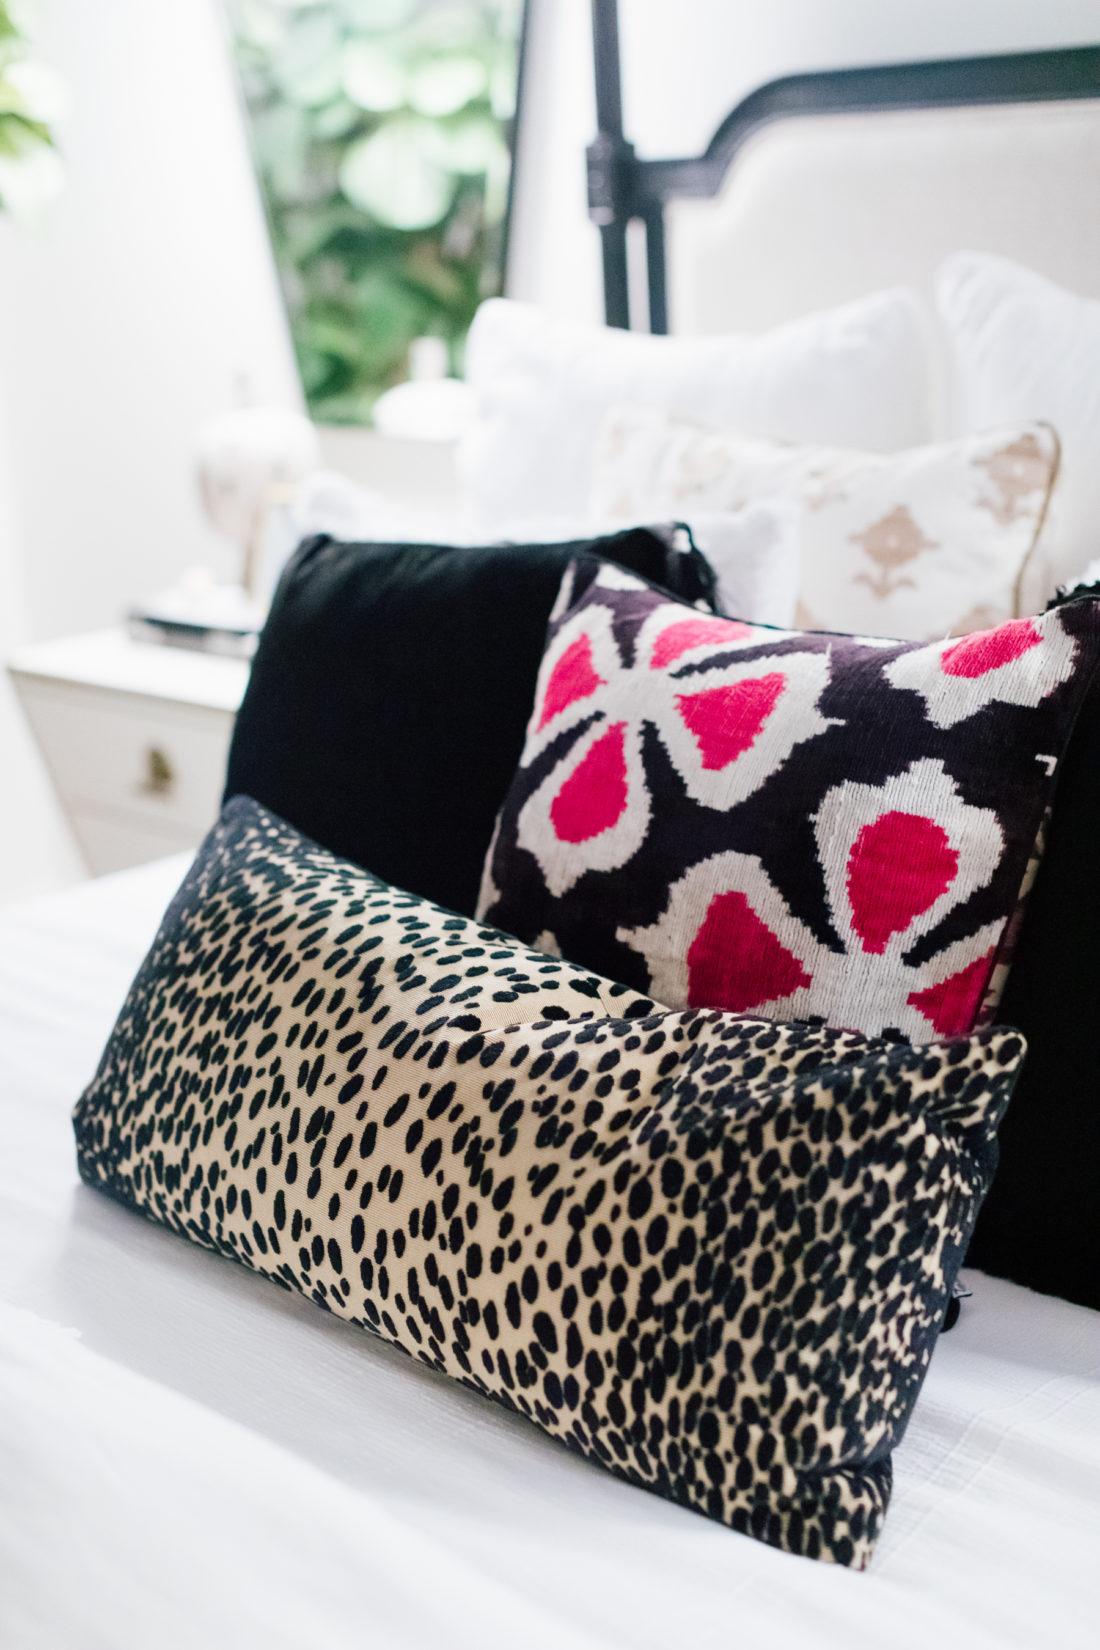 The pillows inside Eva Amurri Martino's new master bedroom